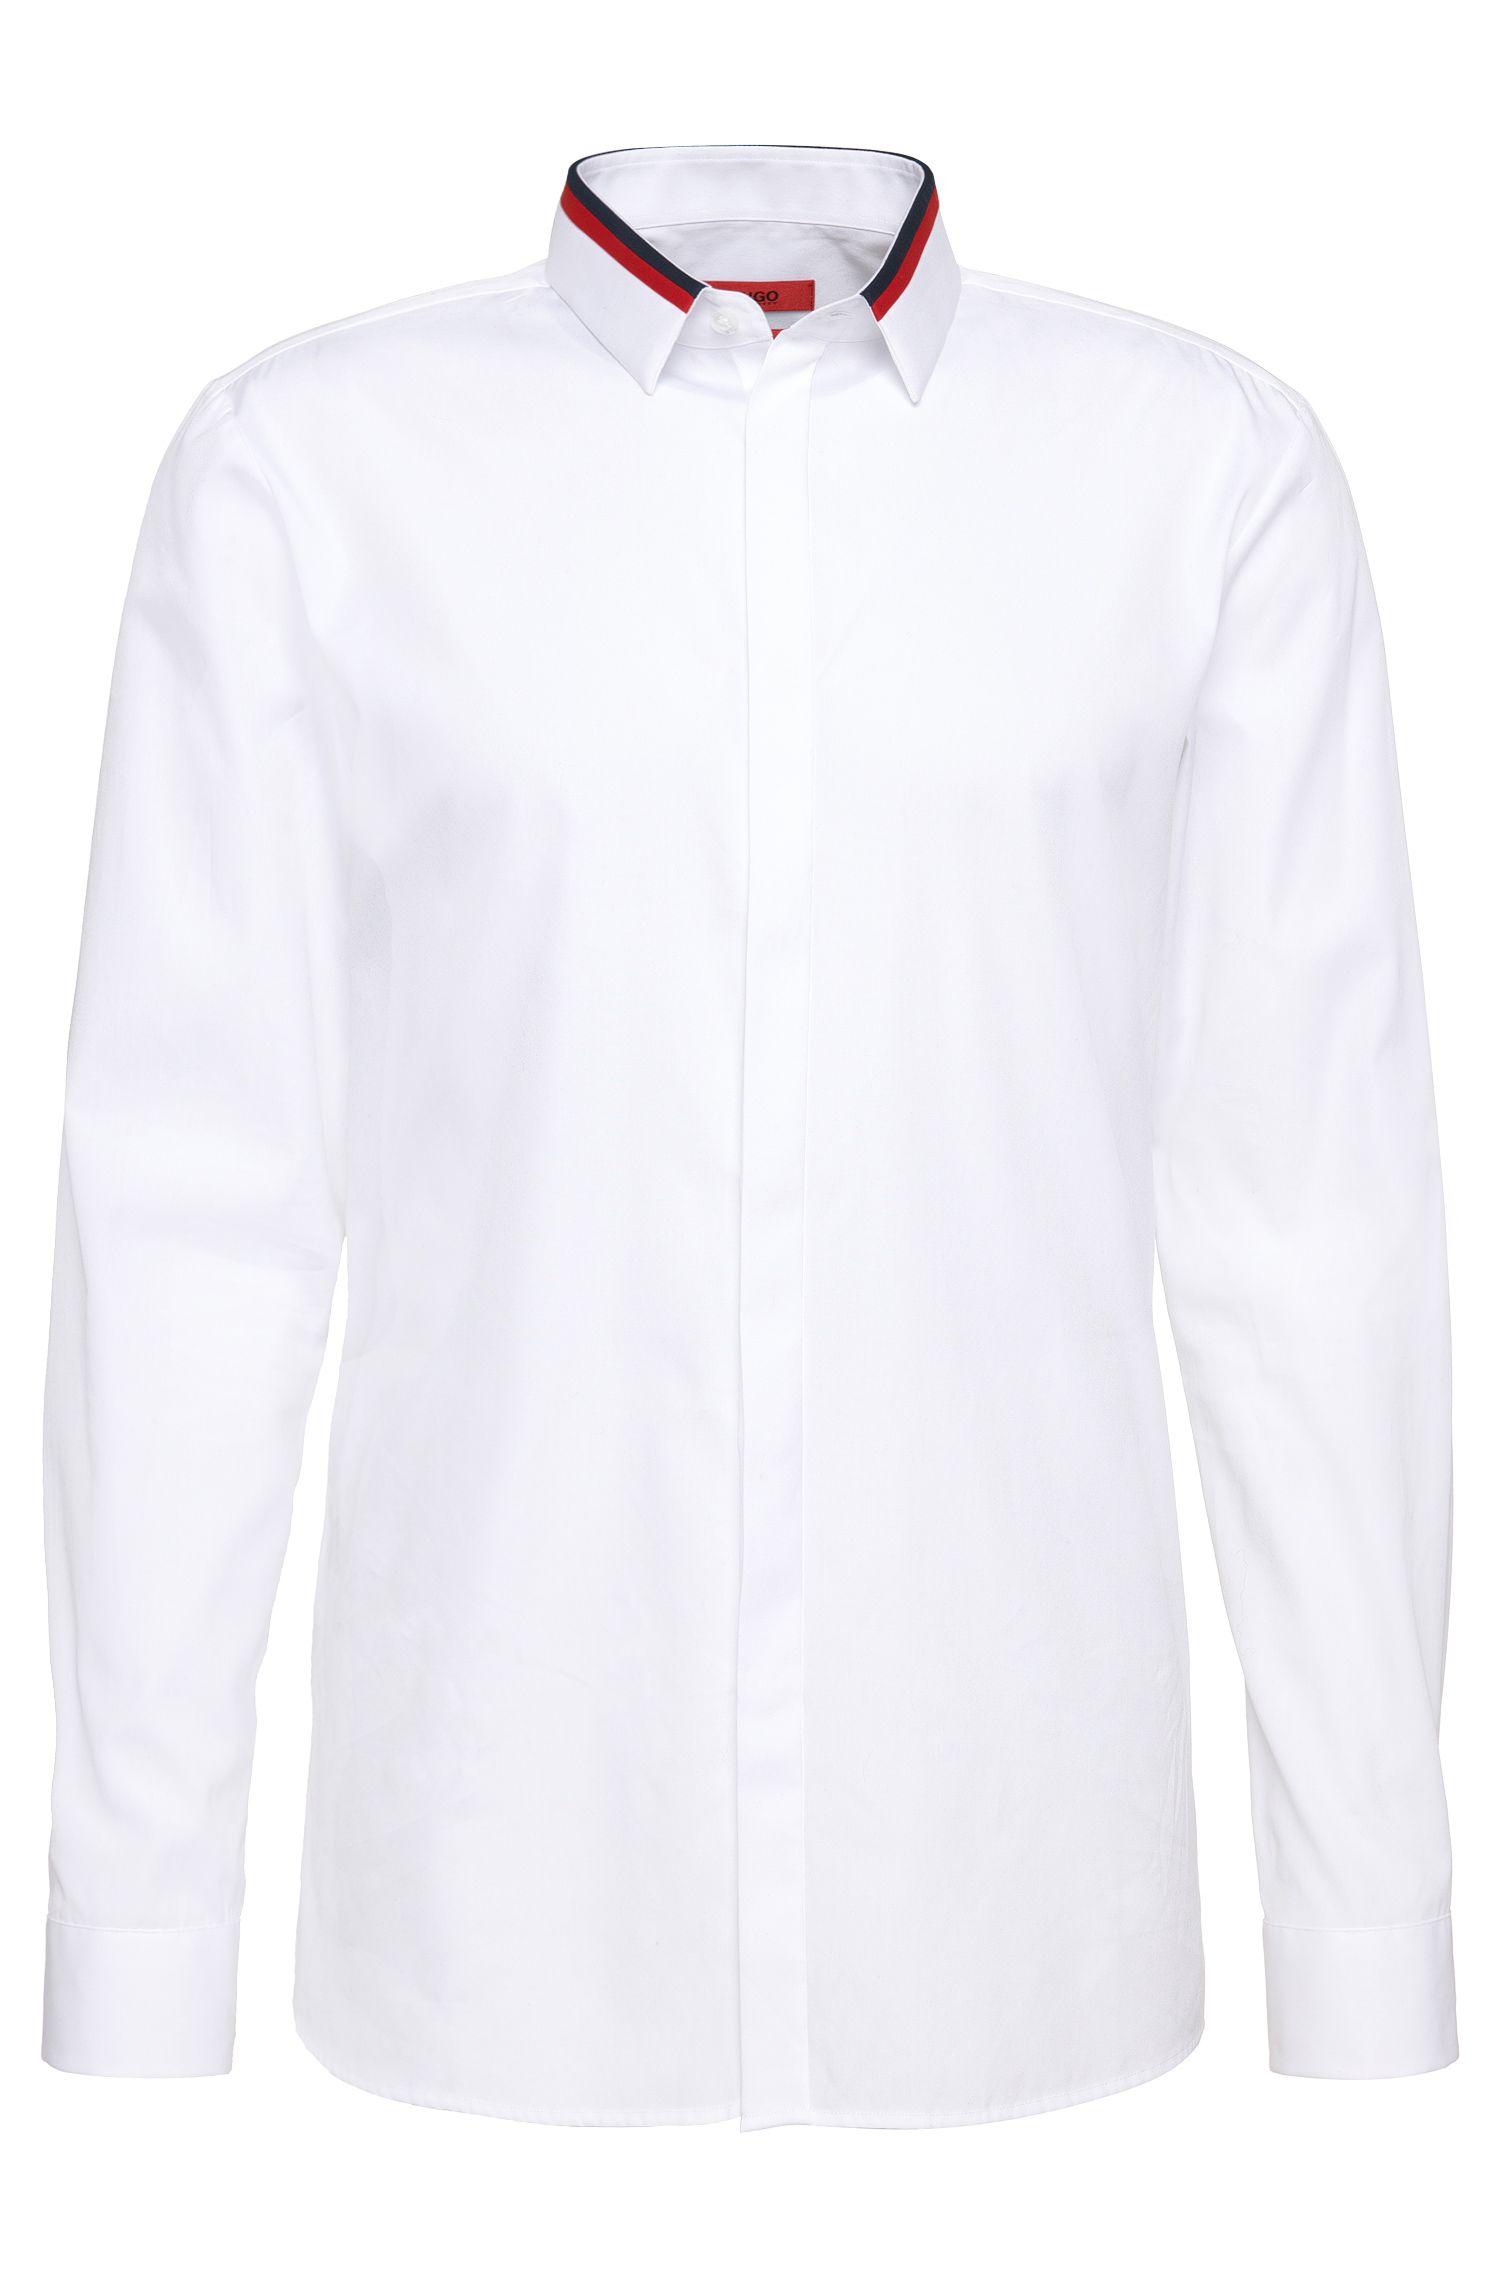 'Ewid' | Slim Fit, Cotton Contrast Button Down Shirt